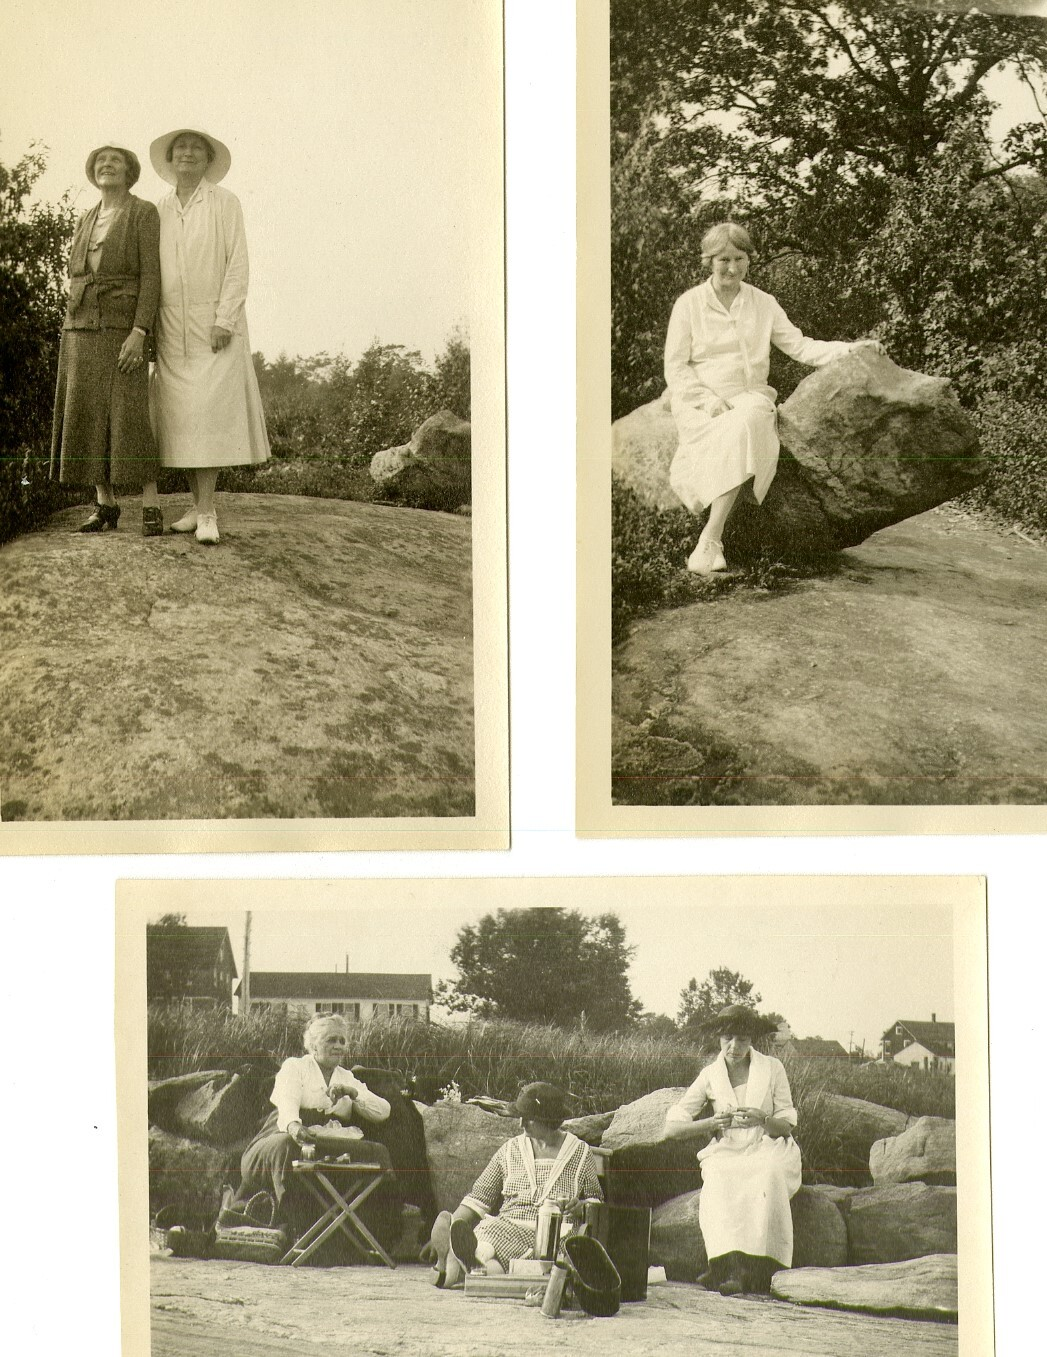 Photographs of Anna Hempstead Branch